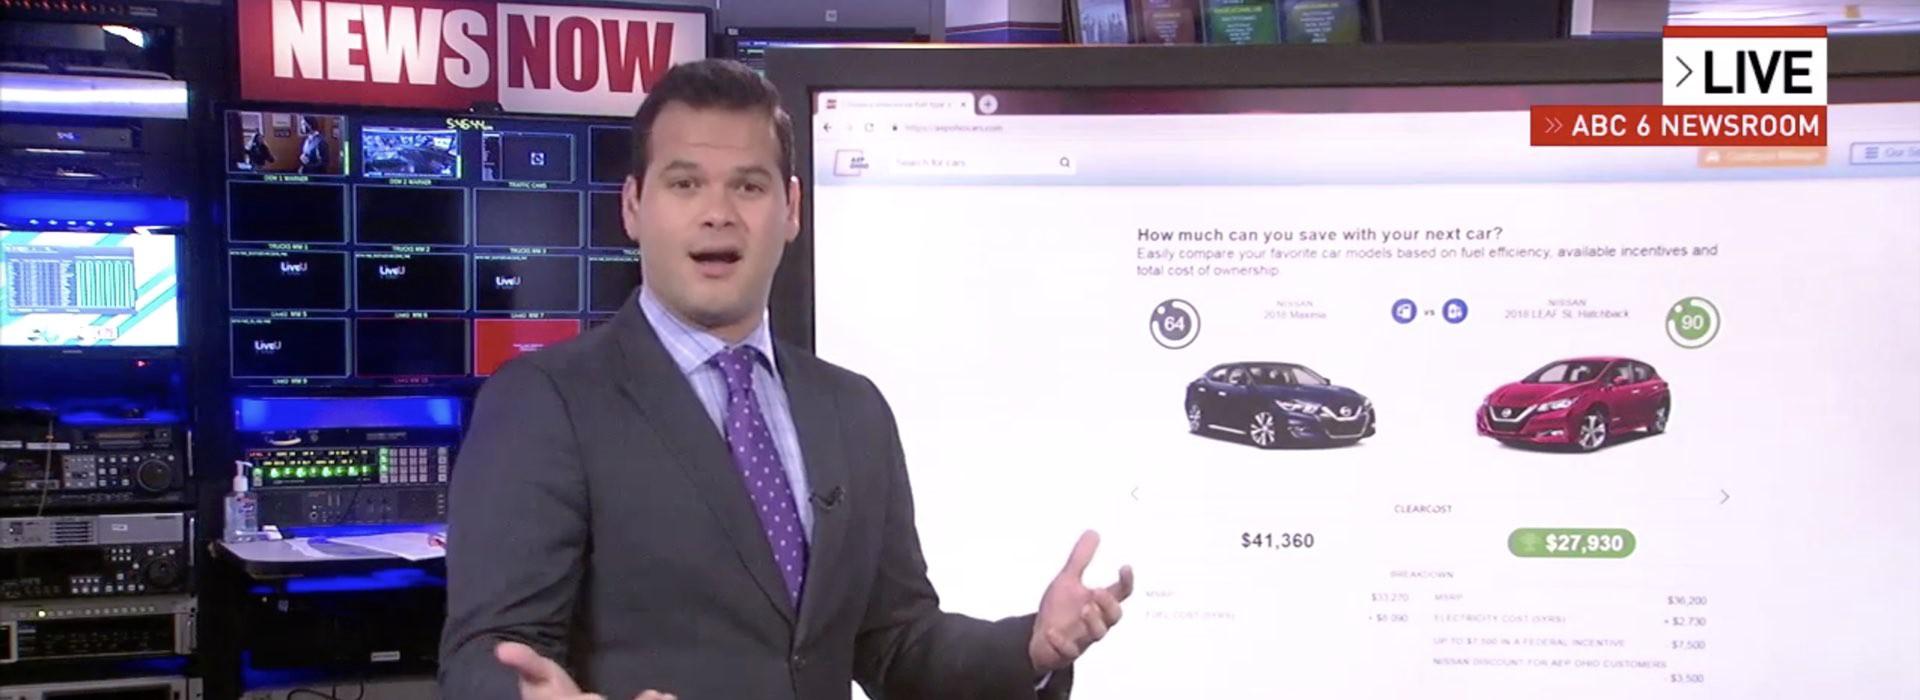 AEP Ohio Cars explained by ABC News